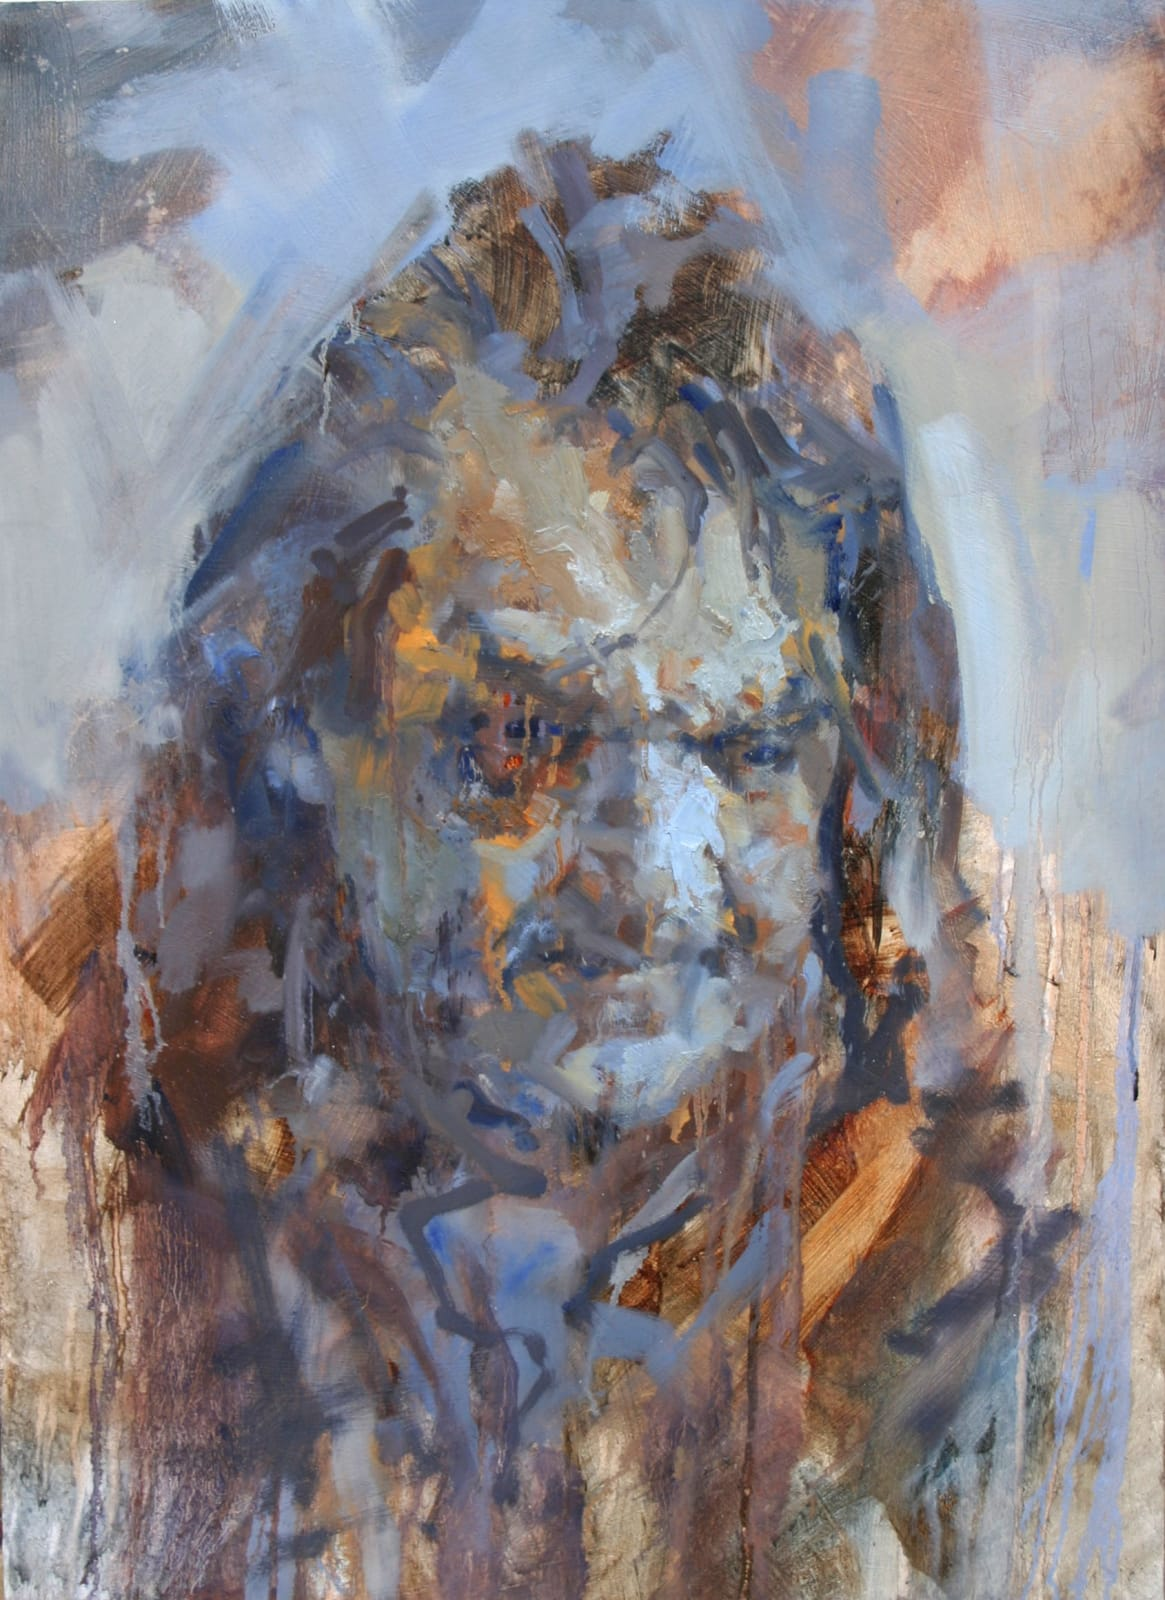 Cian McLoughlin Johnny 'Pops' Connors III Oil on board 74 x 53 cm